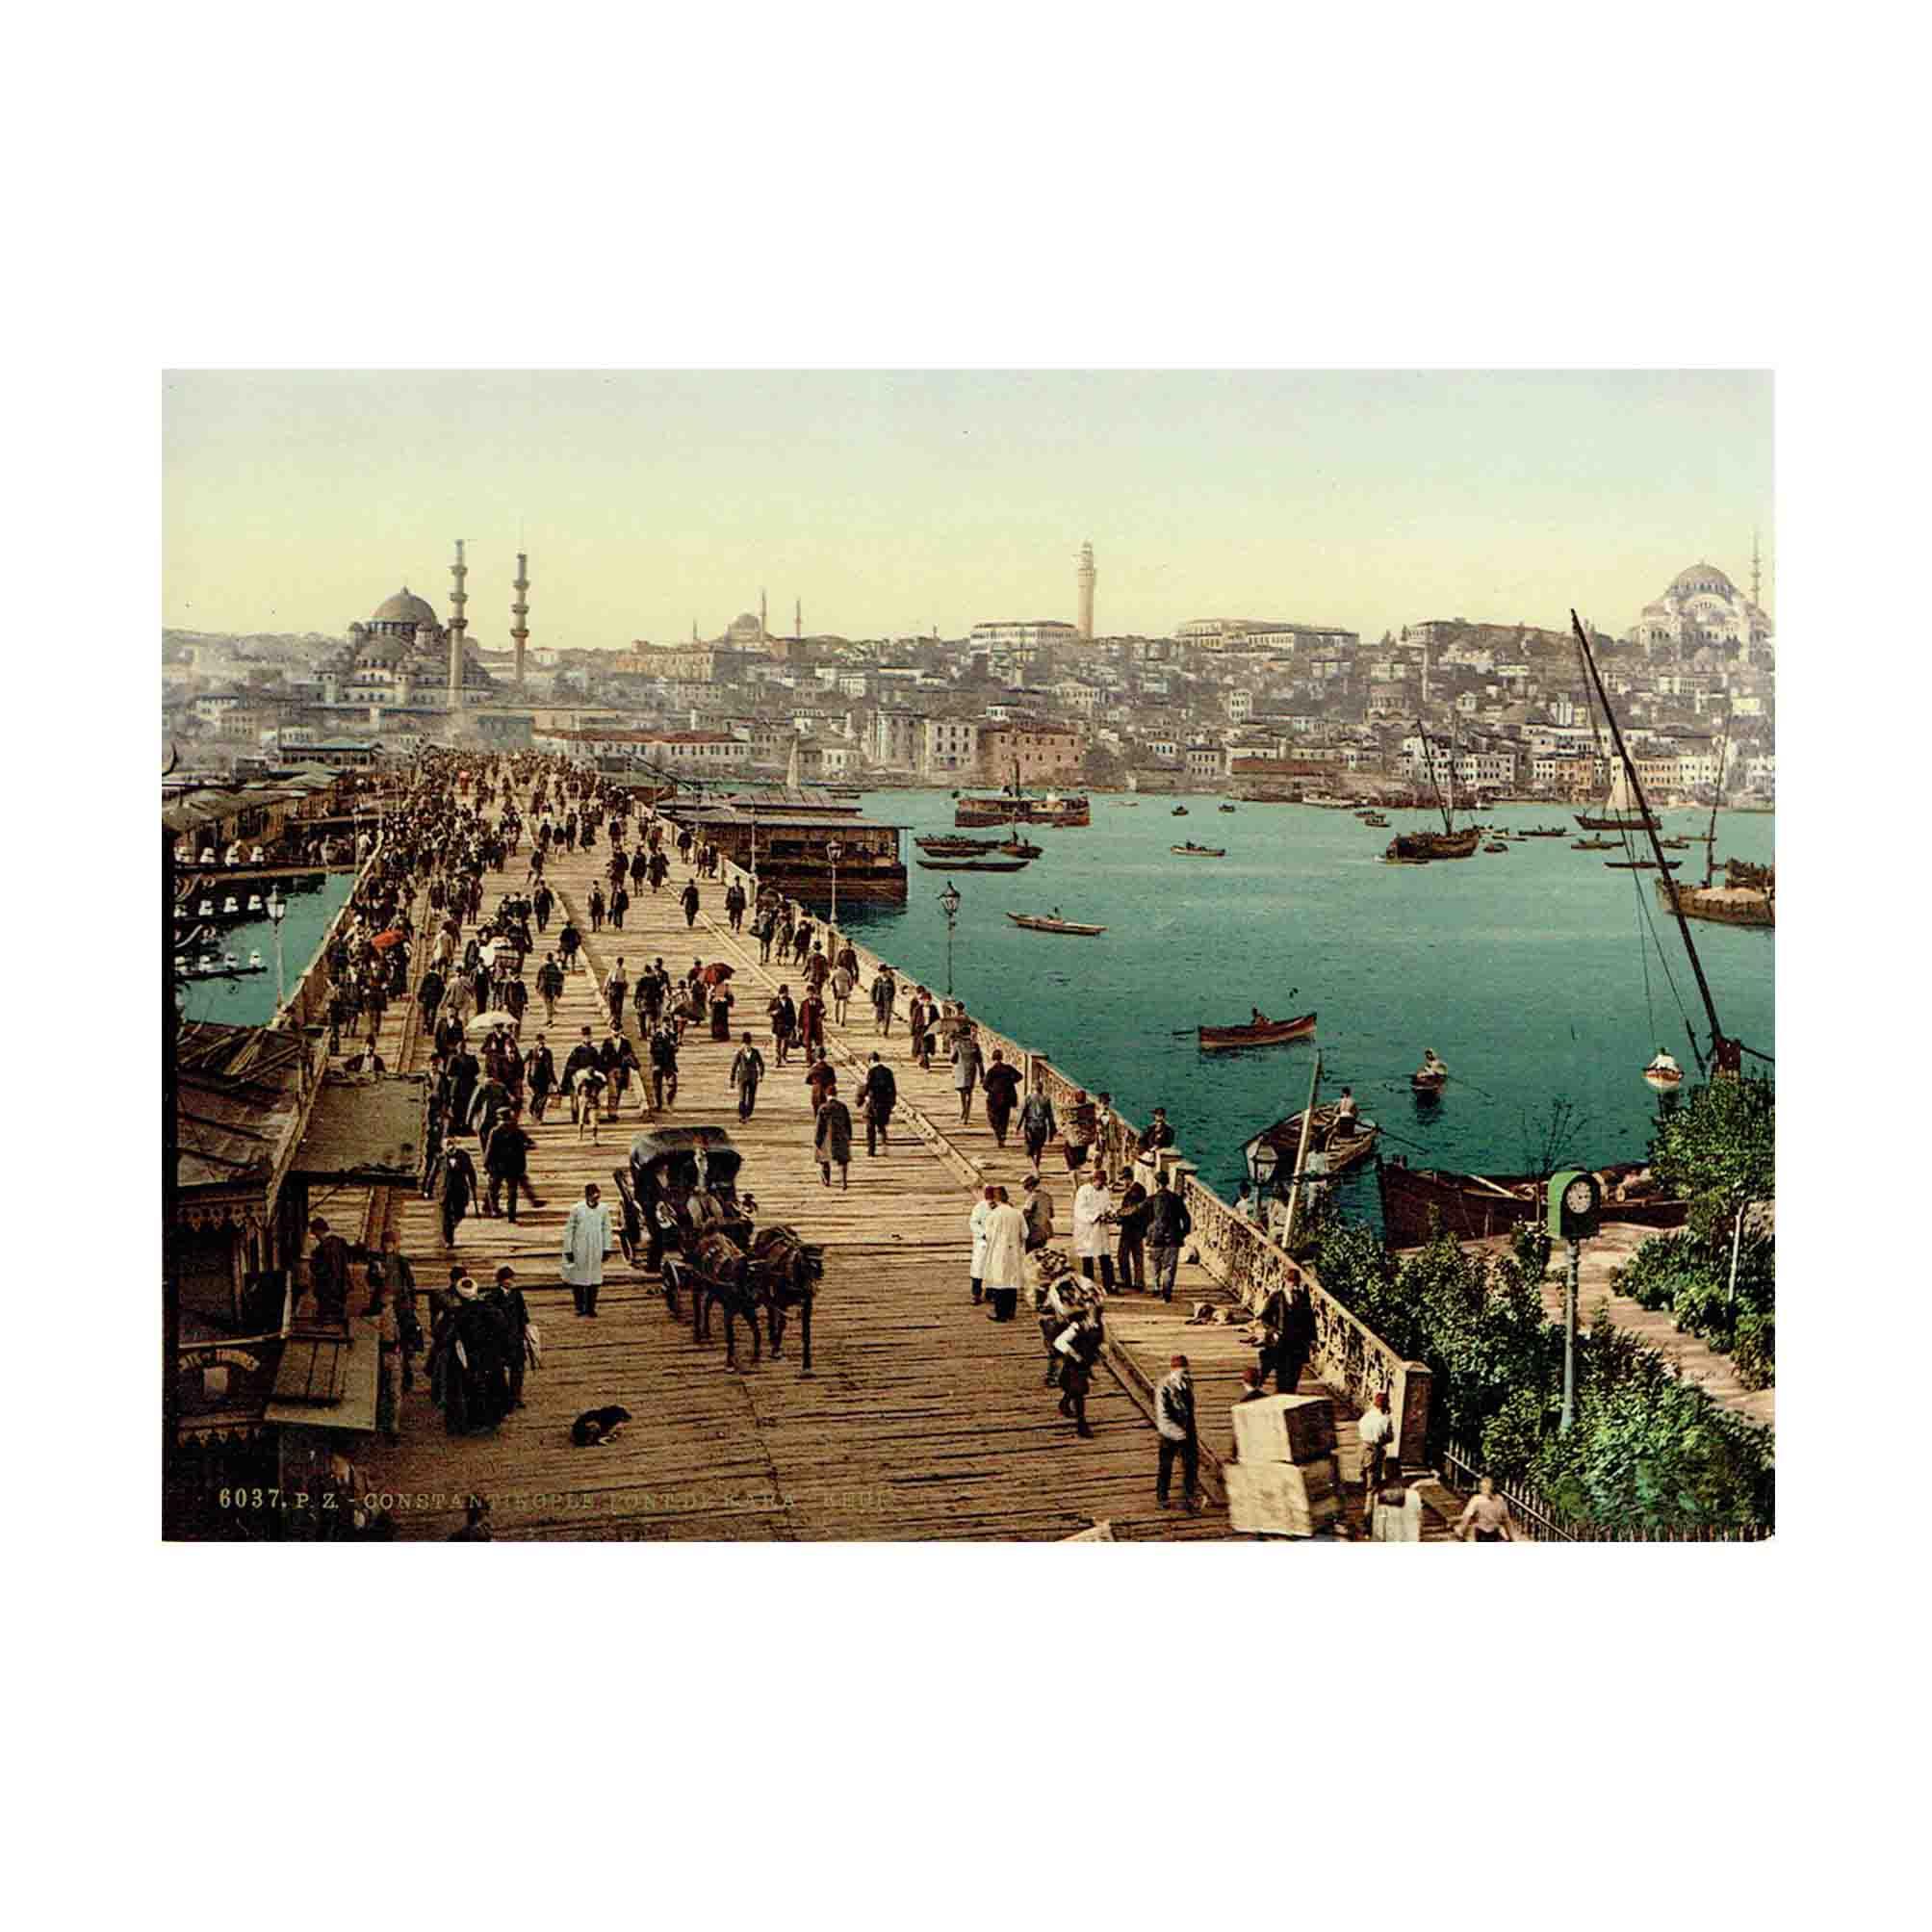 5984-Set-21-Photochrom-Constantinople-6037-Kara-Keui-Galata-bridge-Constantinople-1890-1900-N.jpeg